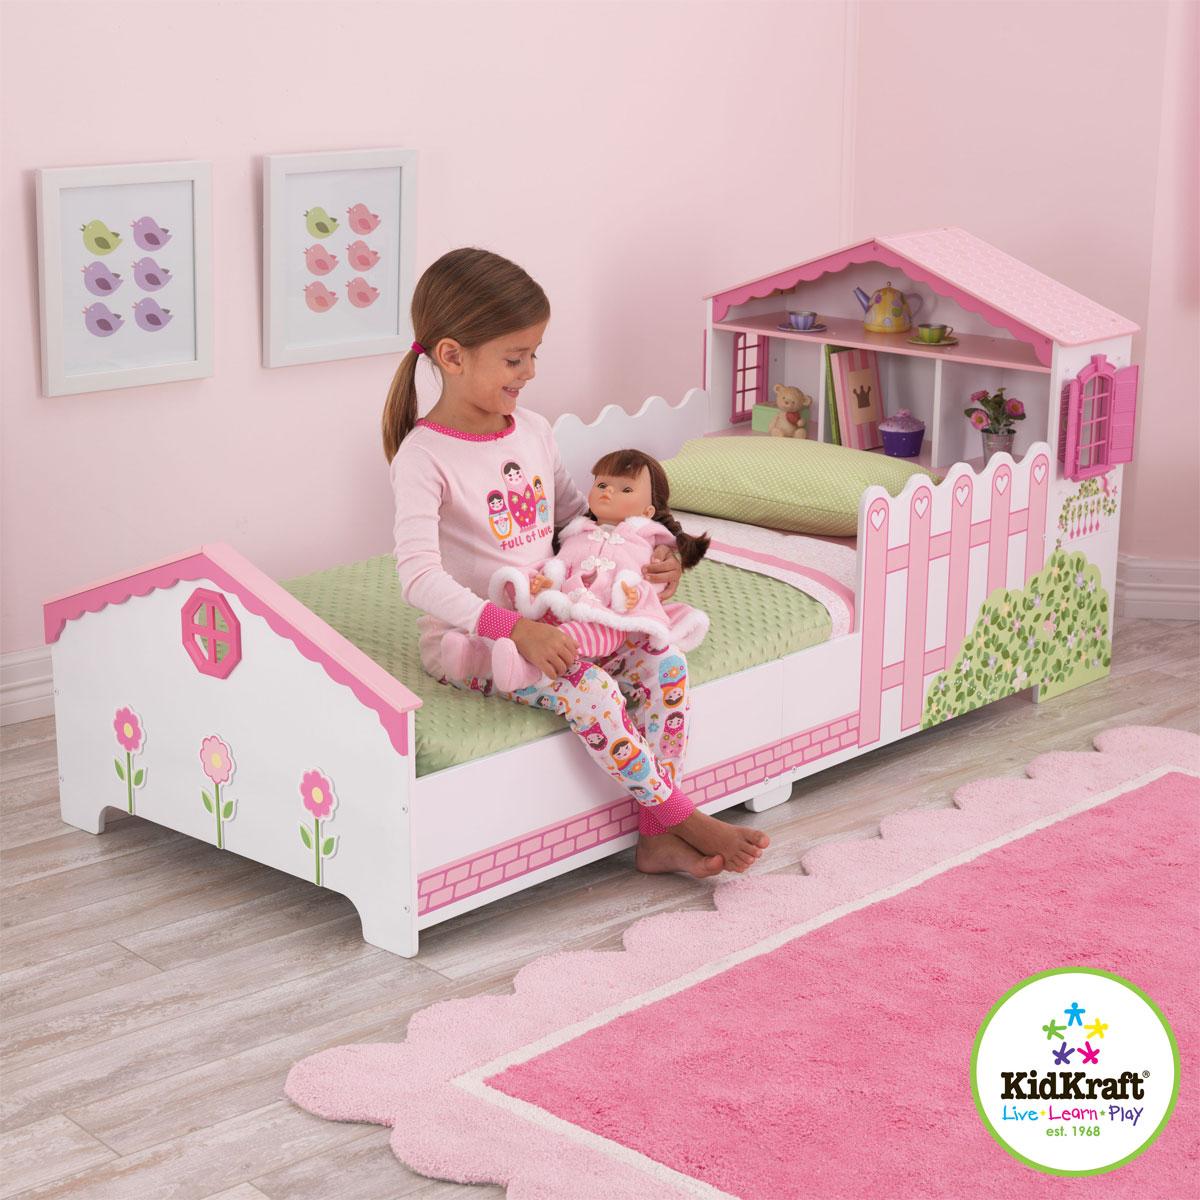 Kidkraft Dollhouse Toddler Bed 76255